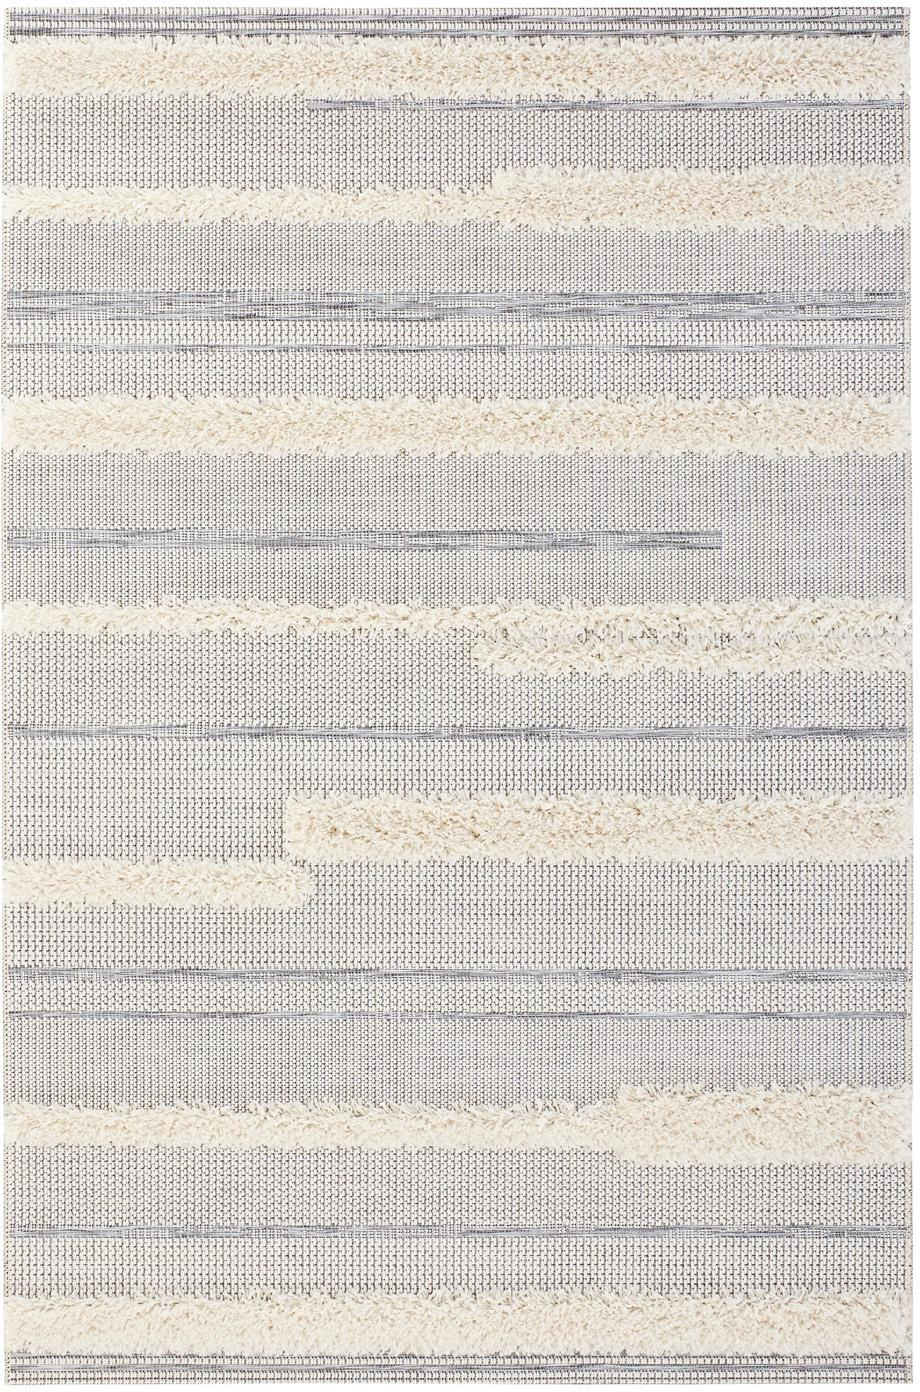 In- & Outdoor-Teppich Ifrane in Grau-Creme, Flor: 100% Polypropylen, Creme, Grau, B 155 x L 230 cm (Grösse M)